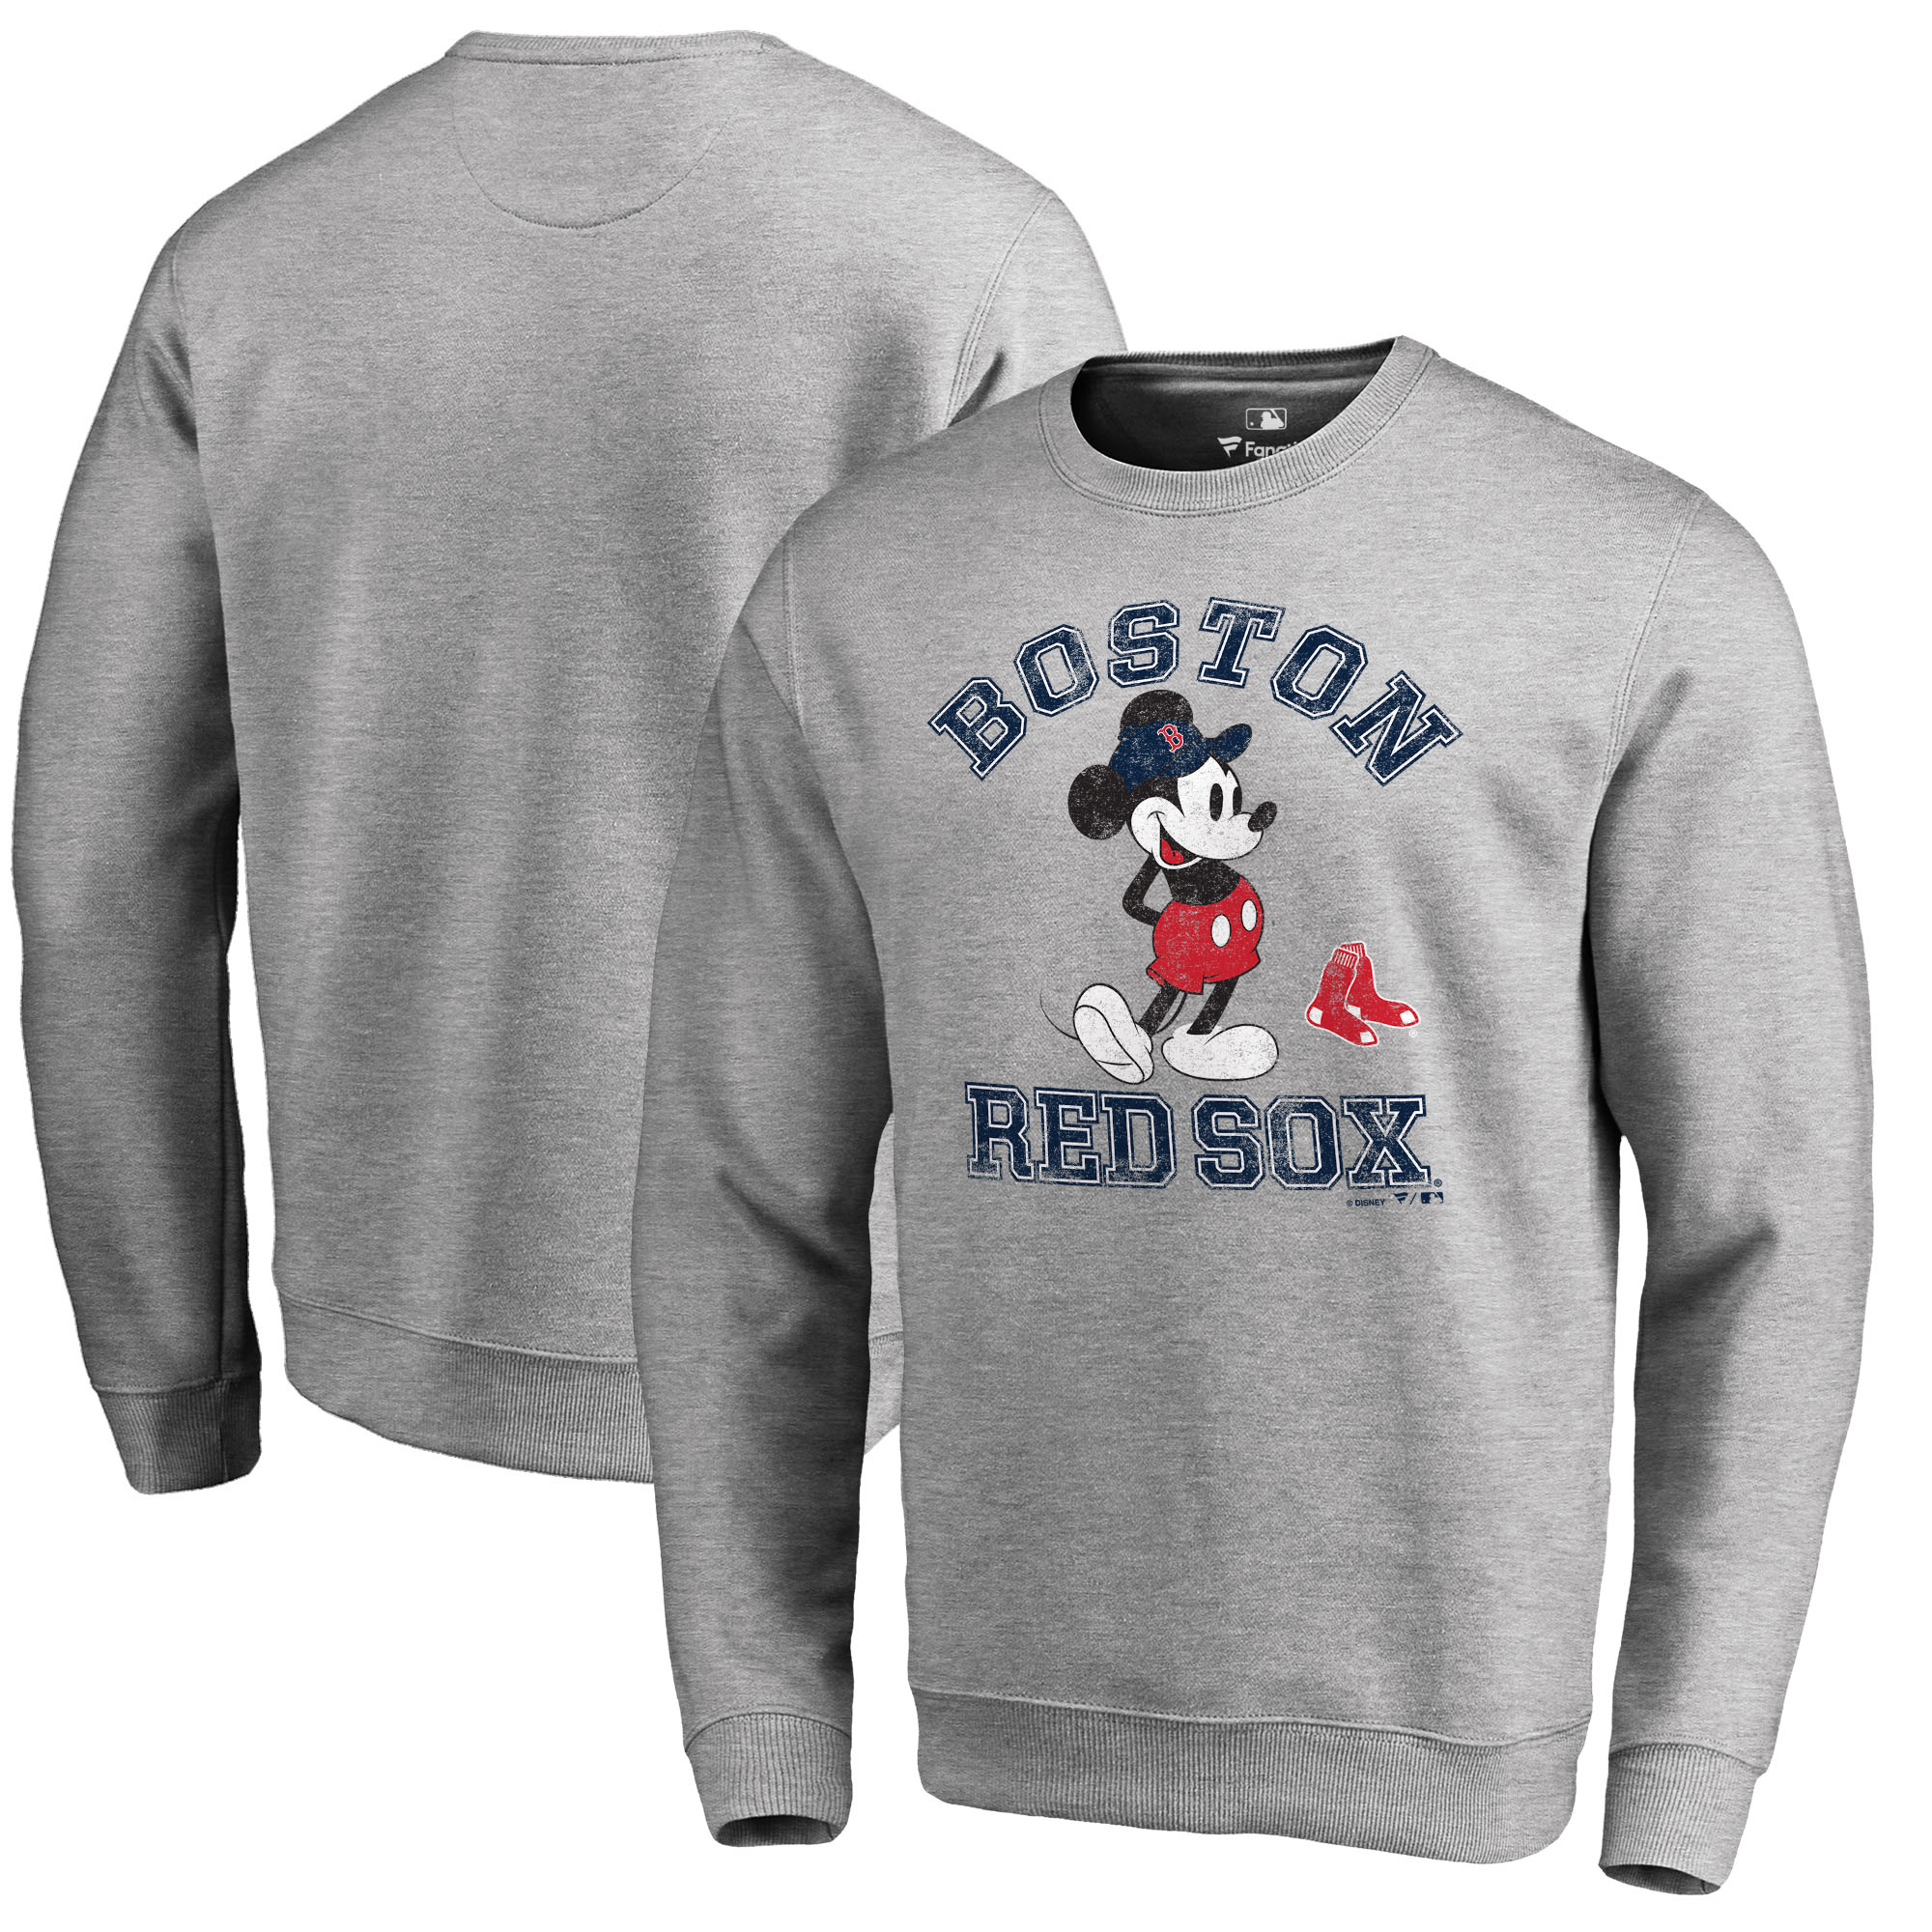 Boston Red Sox Fanatics Branded Disney MLB Tradition Pullover Sweatshirt - Heathered Gray